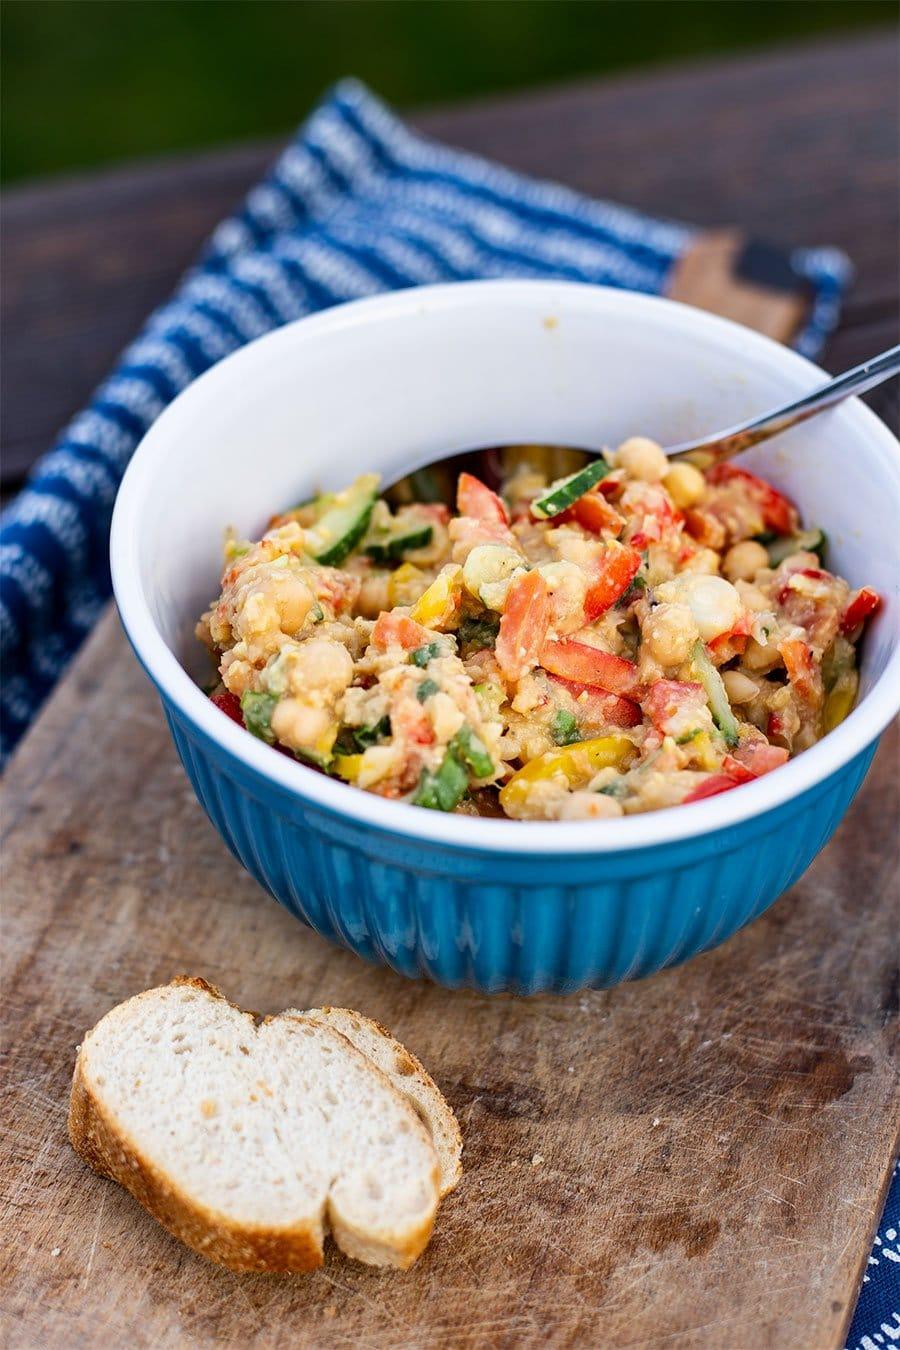 Orientalischer Kichererbsen Salat Rezept Zum Grillen Vegan